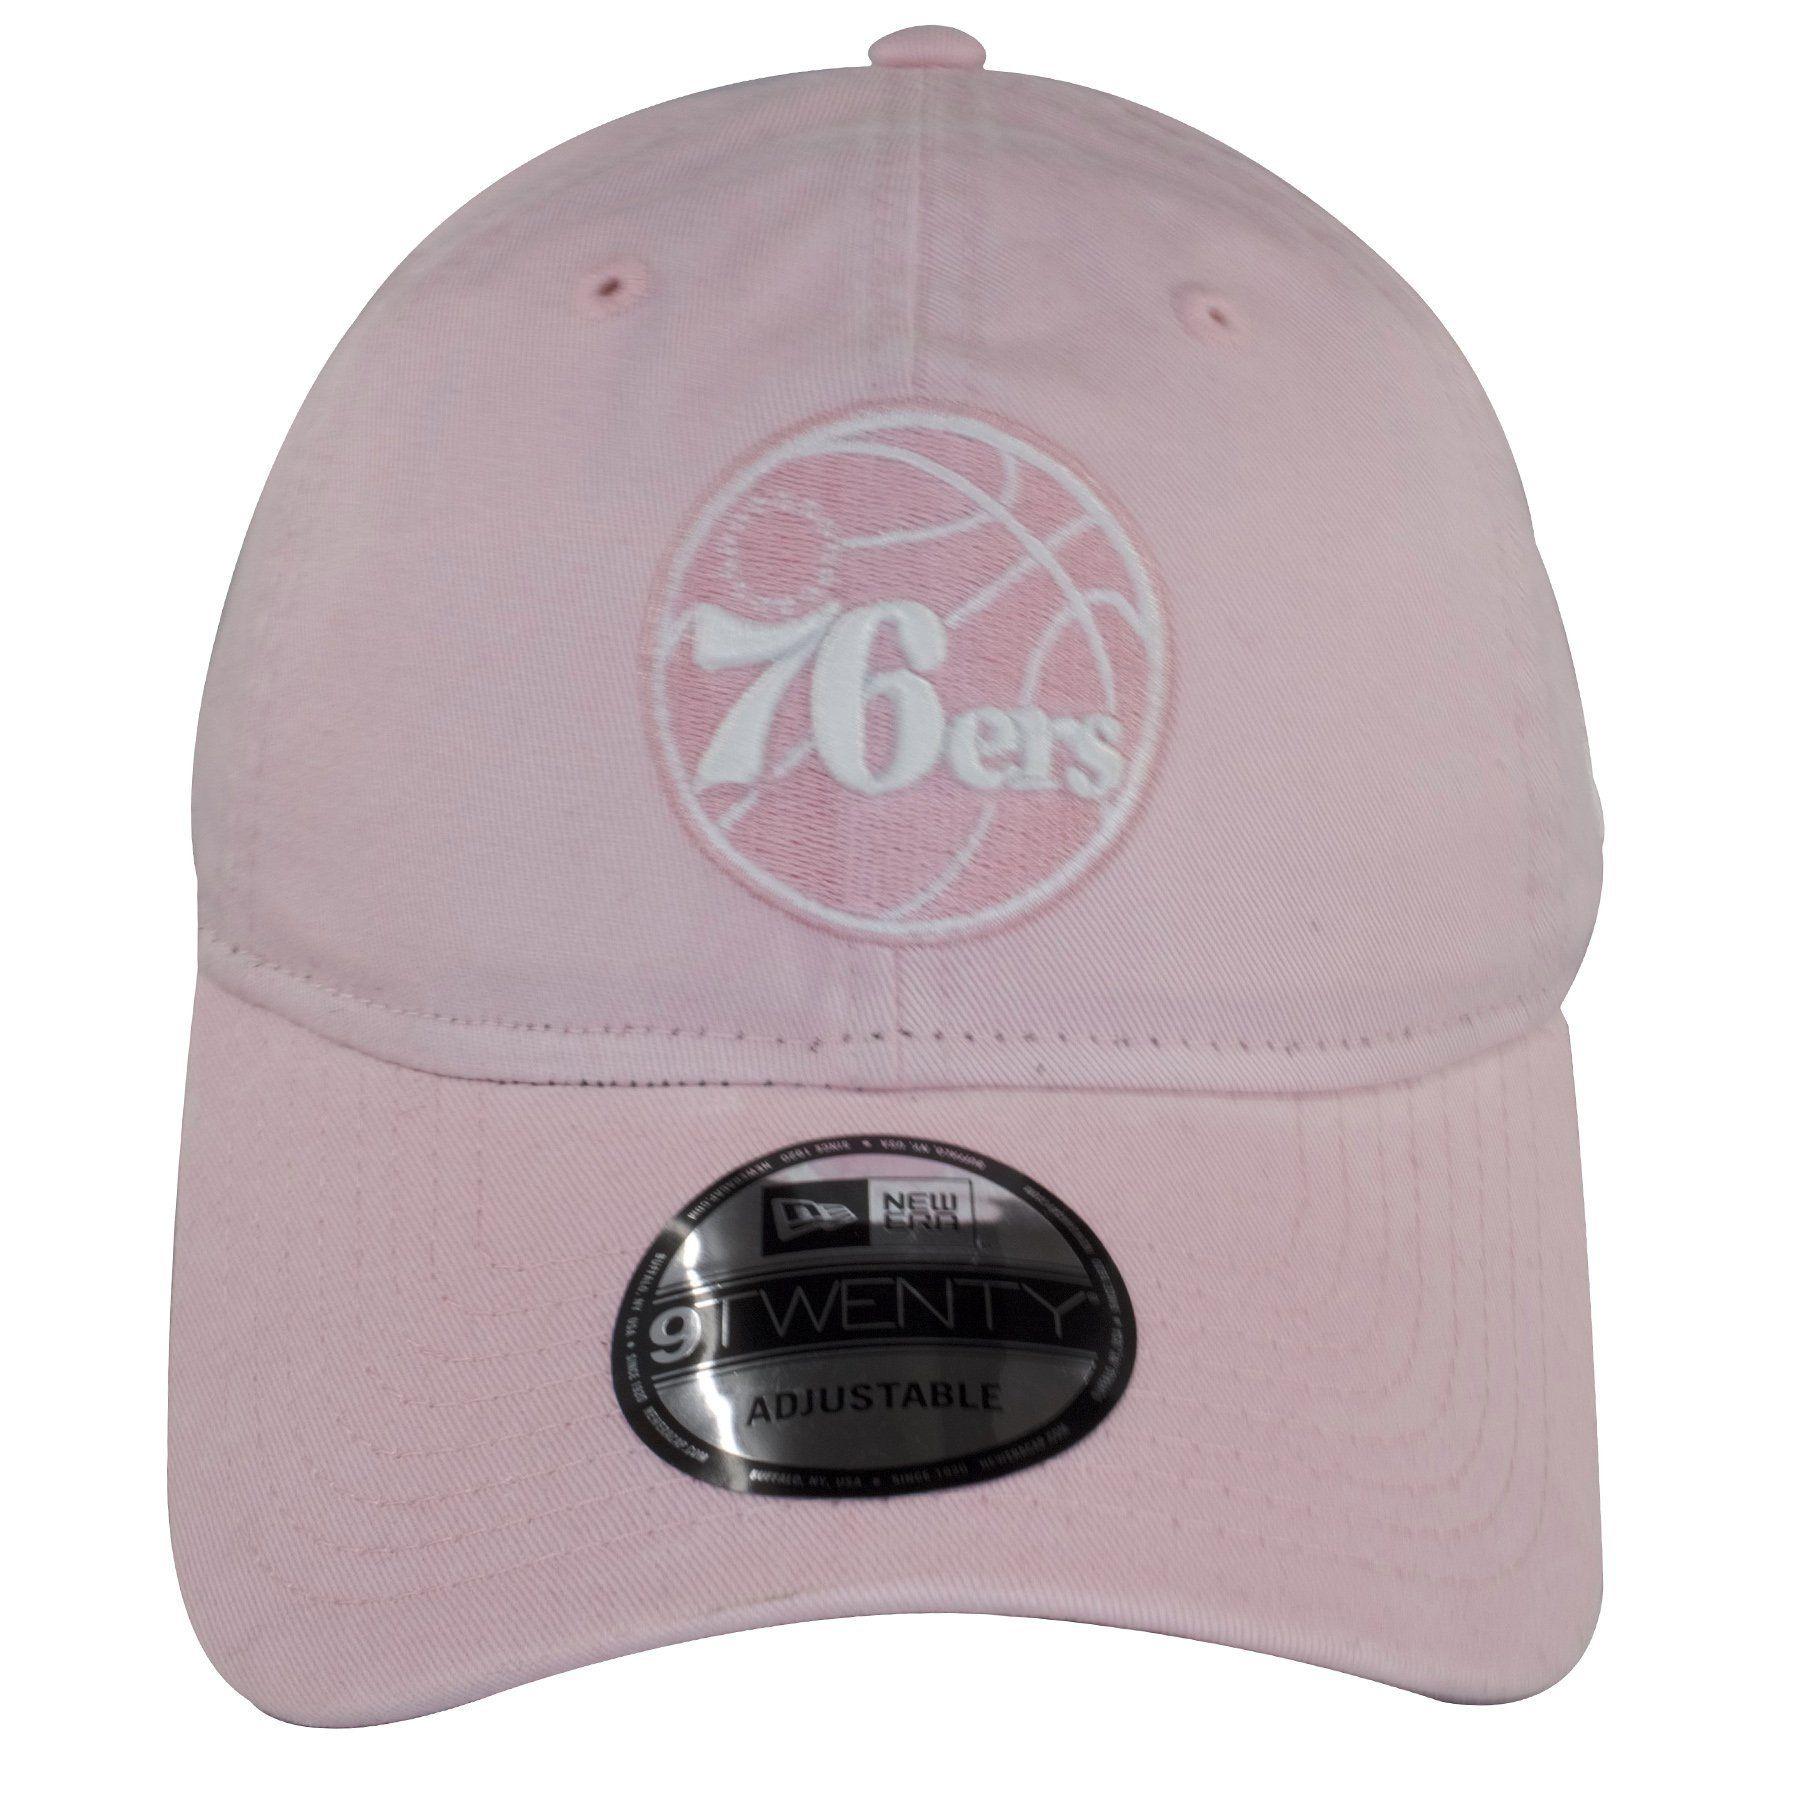 2d4c12c2aca Philadelphia 76ers dad hats available online right now!  philadelphia   philadelphia76ers  philadelphiasixers  phila  philly  sixers  76ers  nba   snowday ...